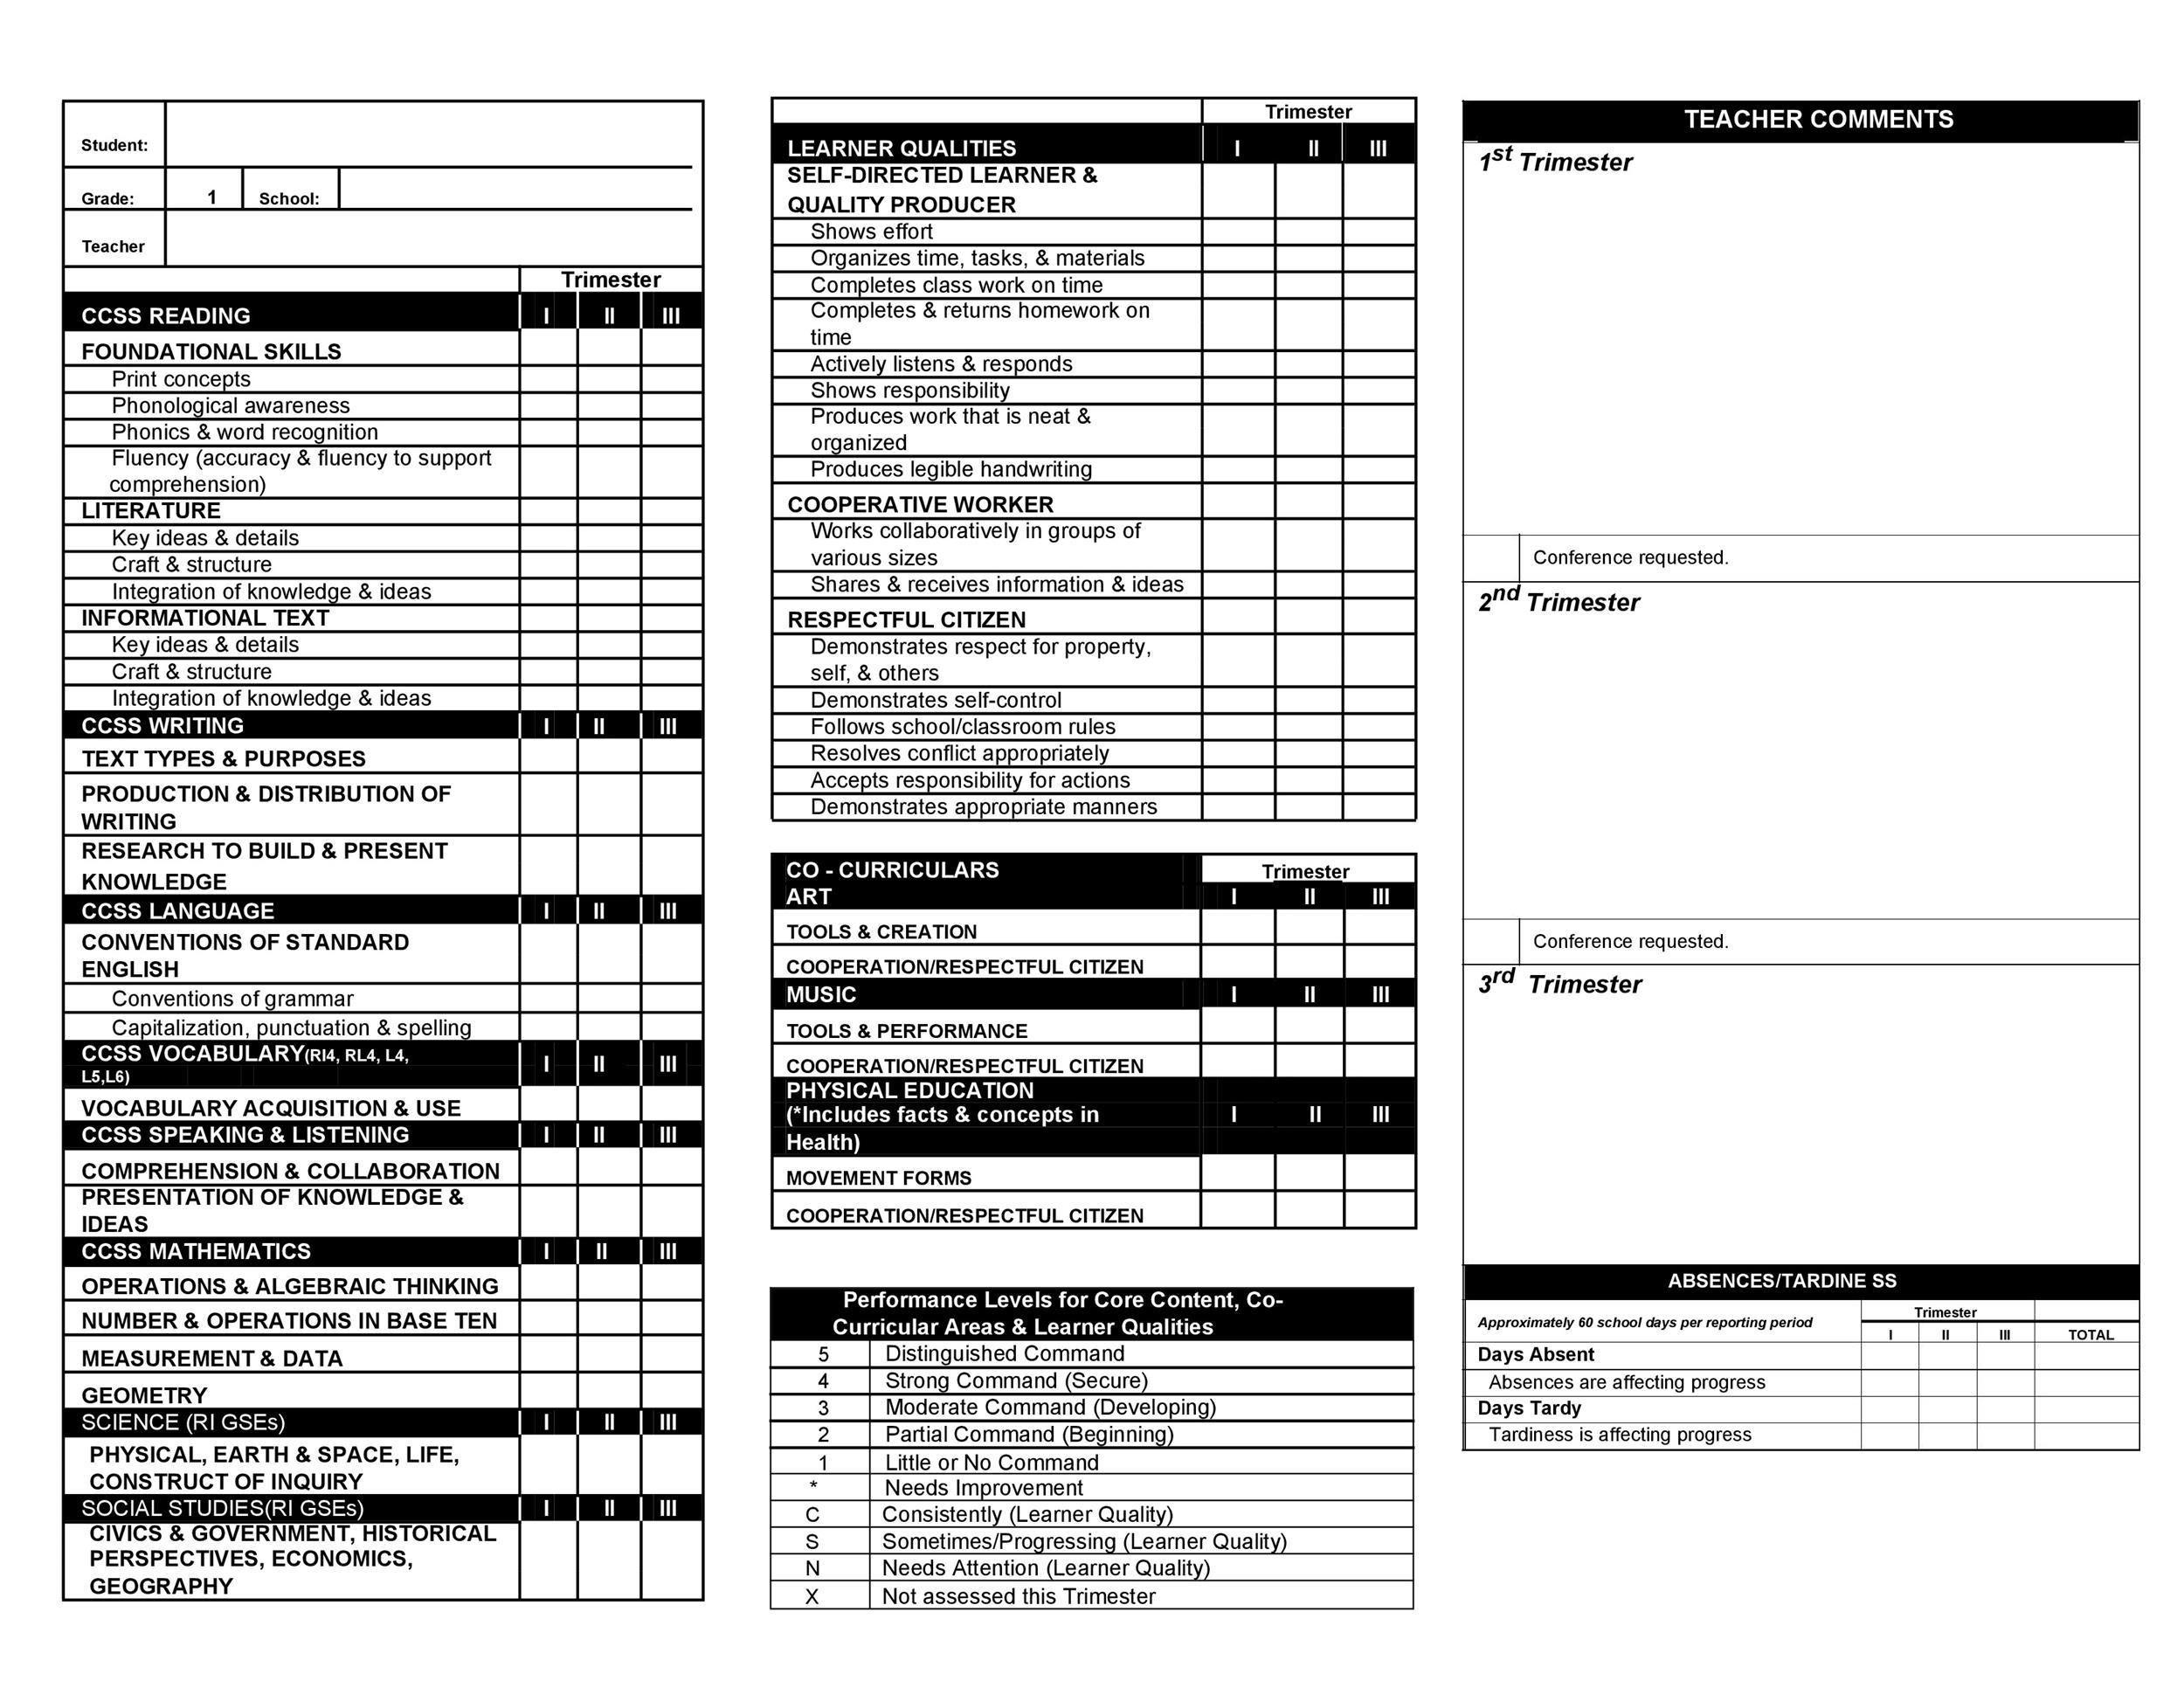 30+ Real  Fake Report Card Templates Homeschool, High School - progress report card template